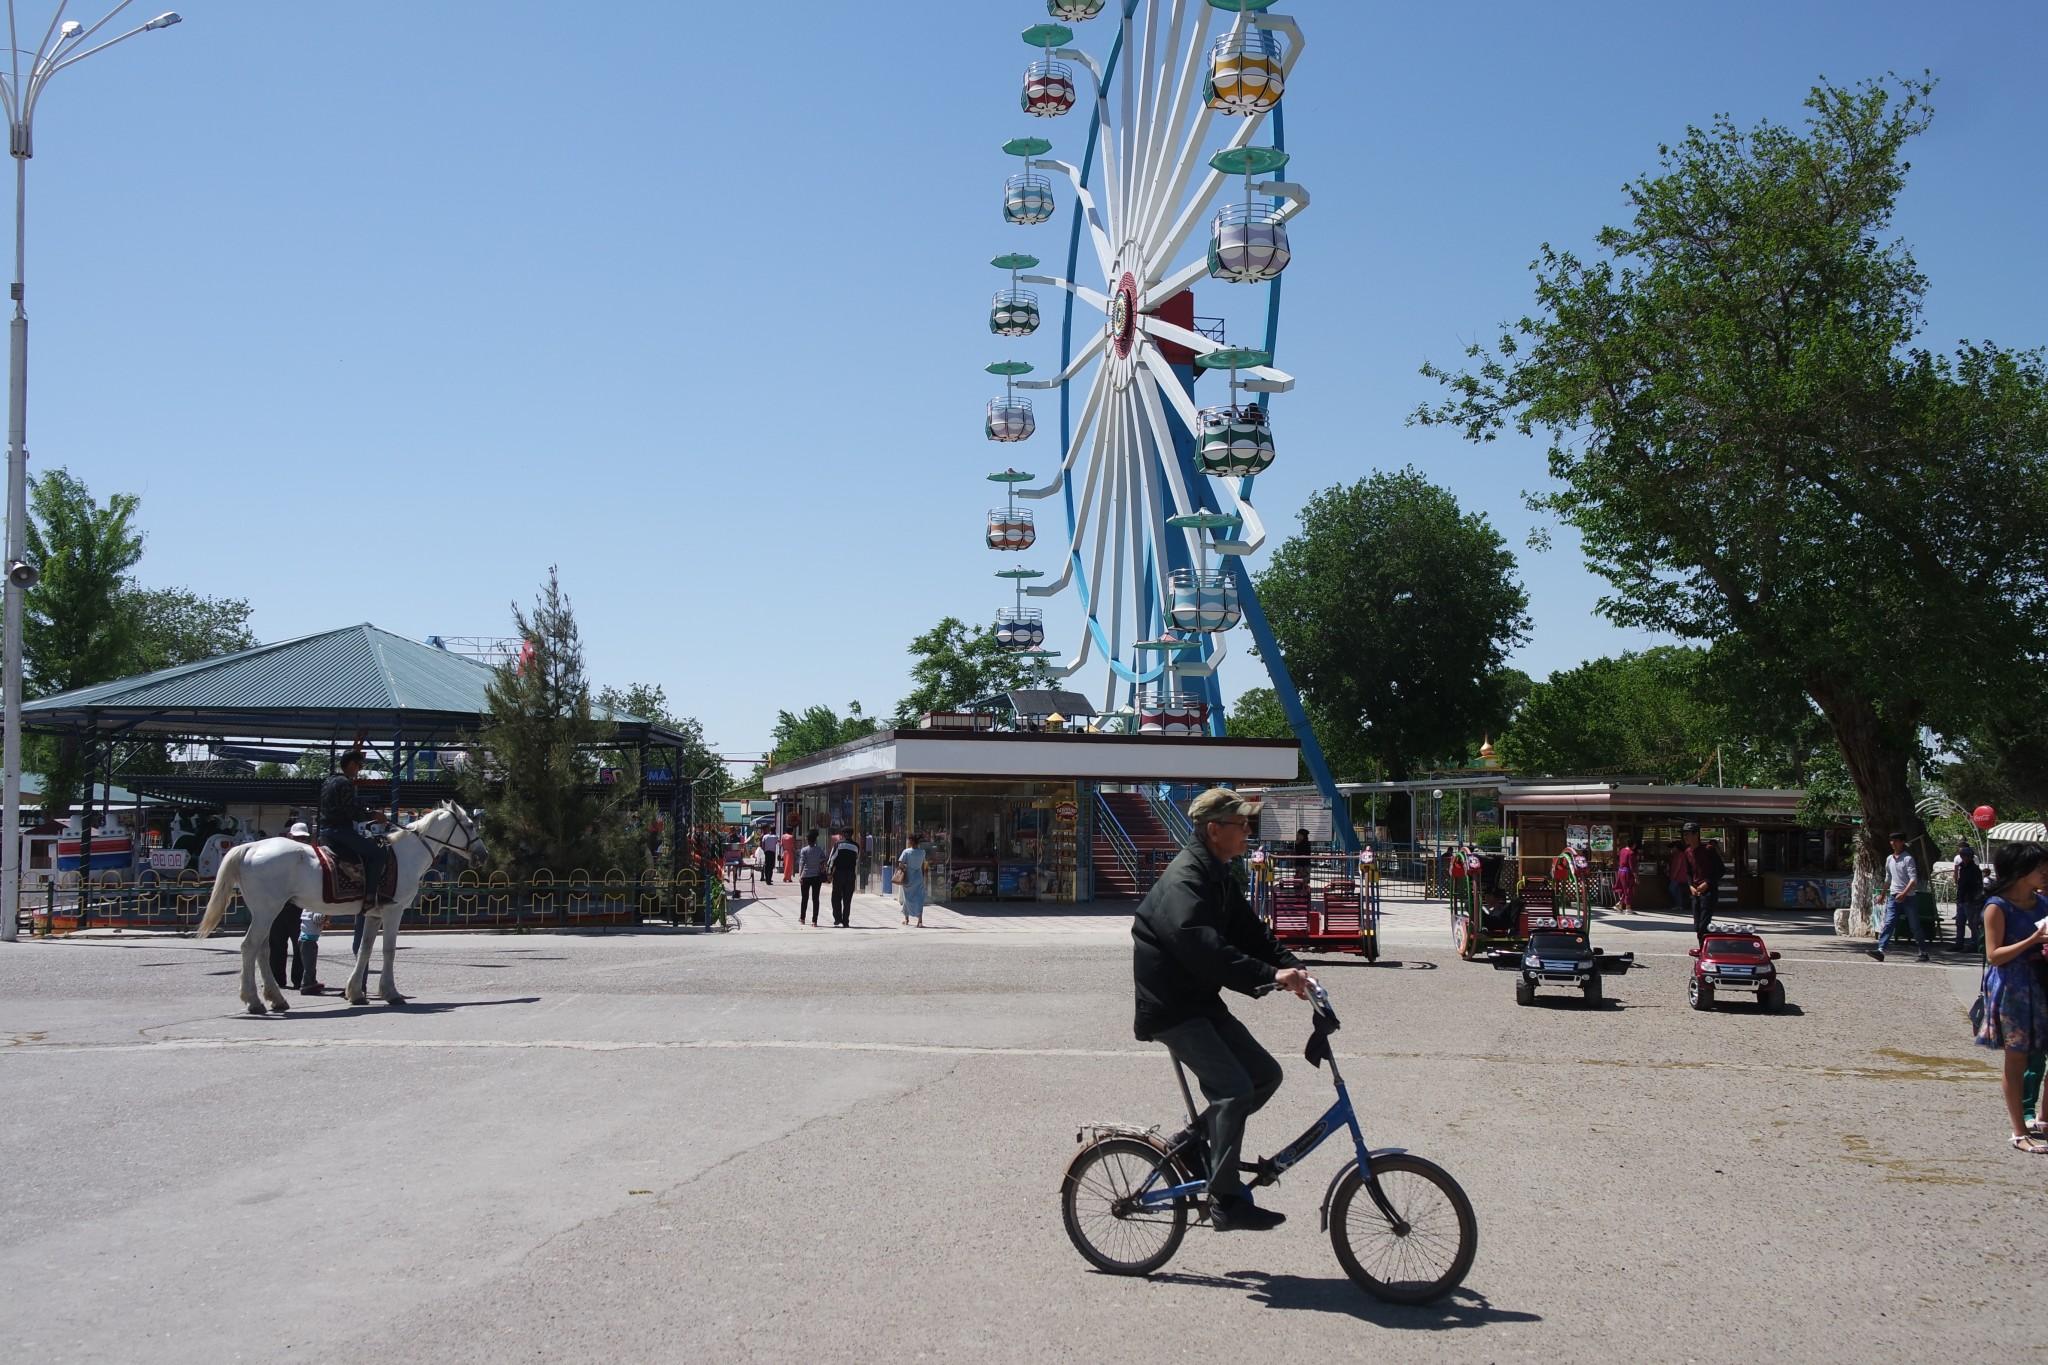 atrakcioni-park-samanidov-buhara